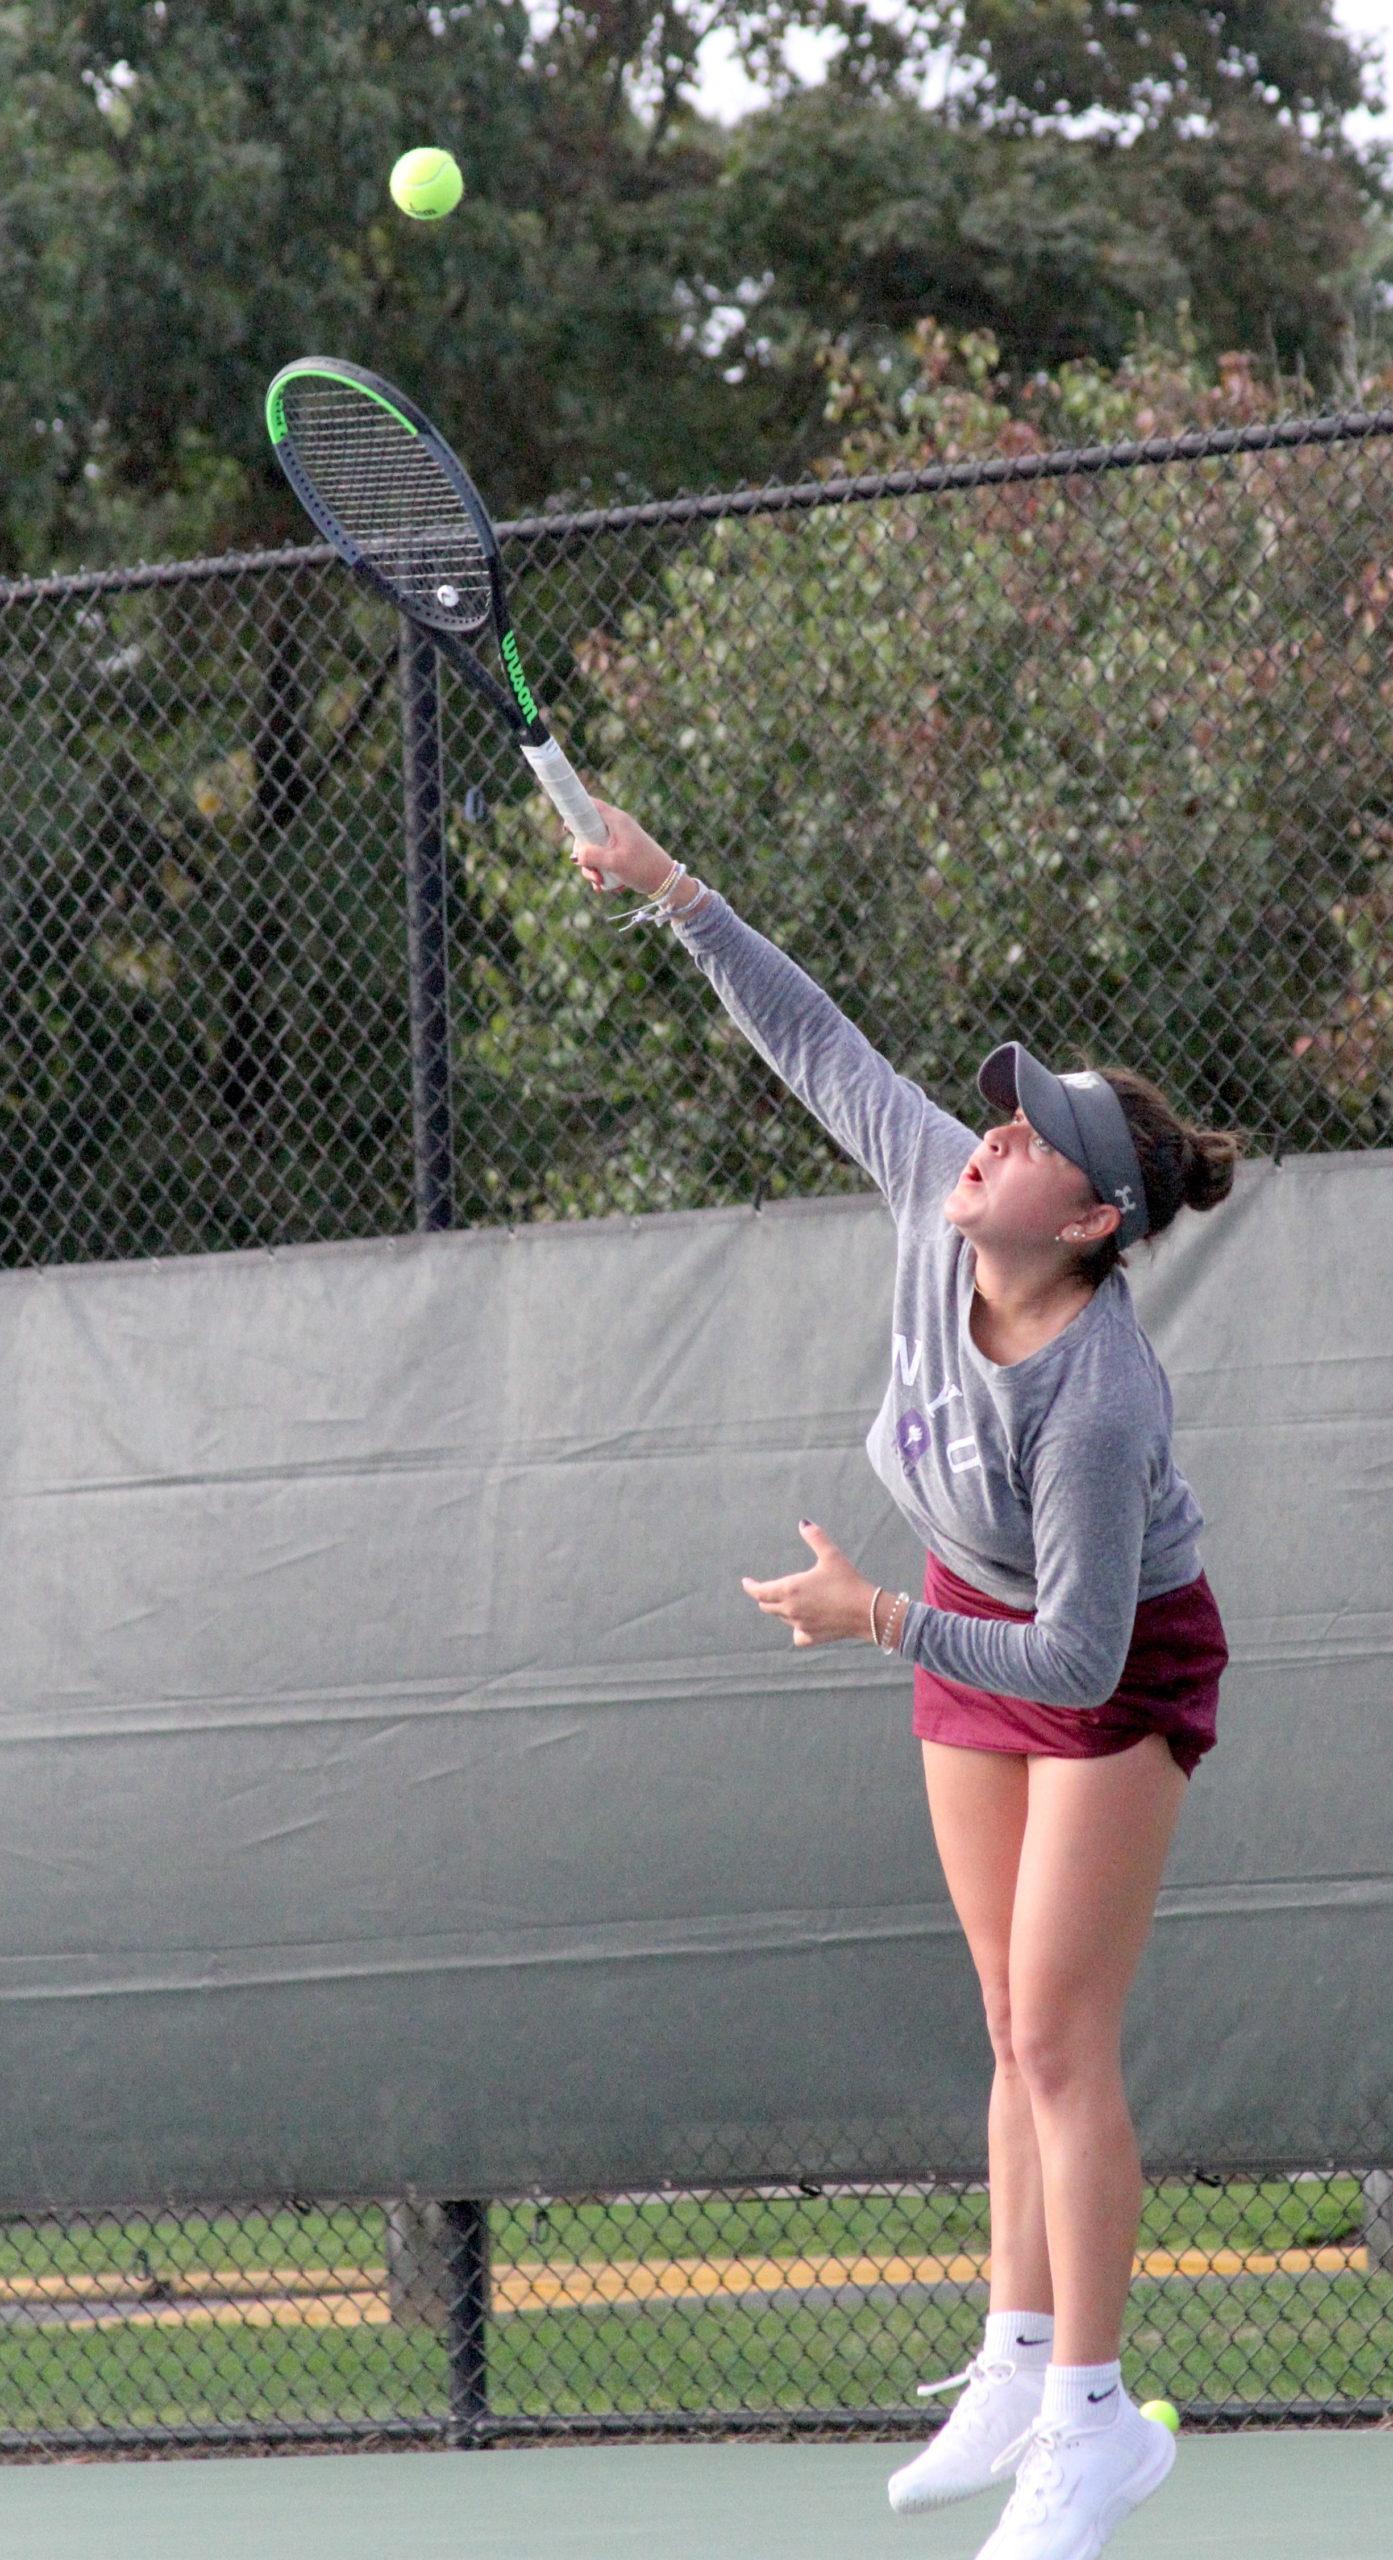 Pierson senior Sandrine Becht serves the the ball at the No. 1 singles spot for East Hampton. DESIRÉE KEEGAN